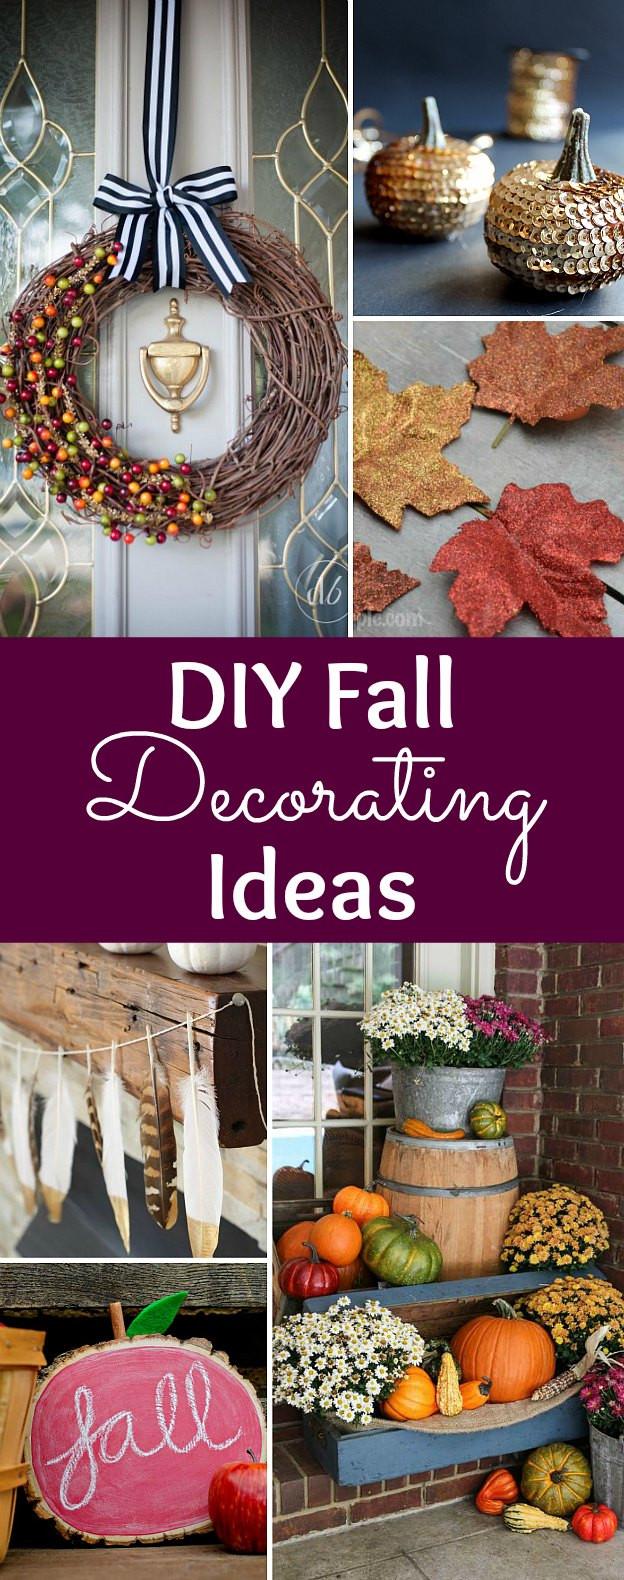 Fall Decorating Ideas DIY  DIY Fall Decorating Ideas